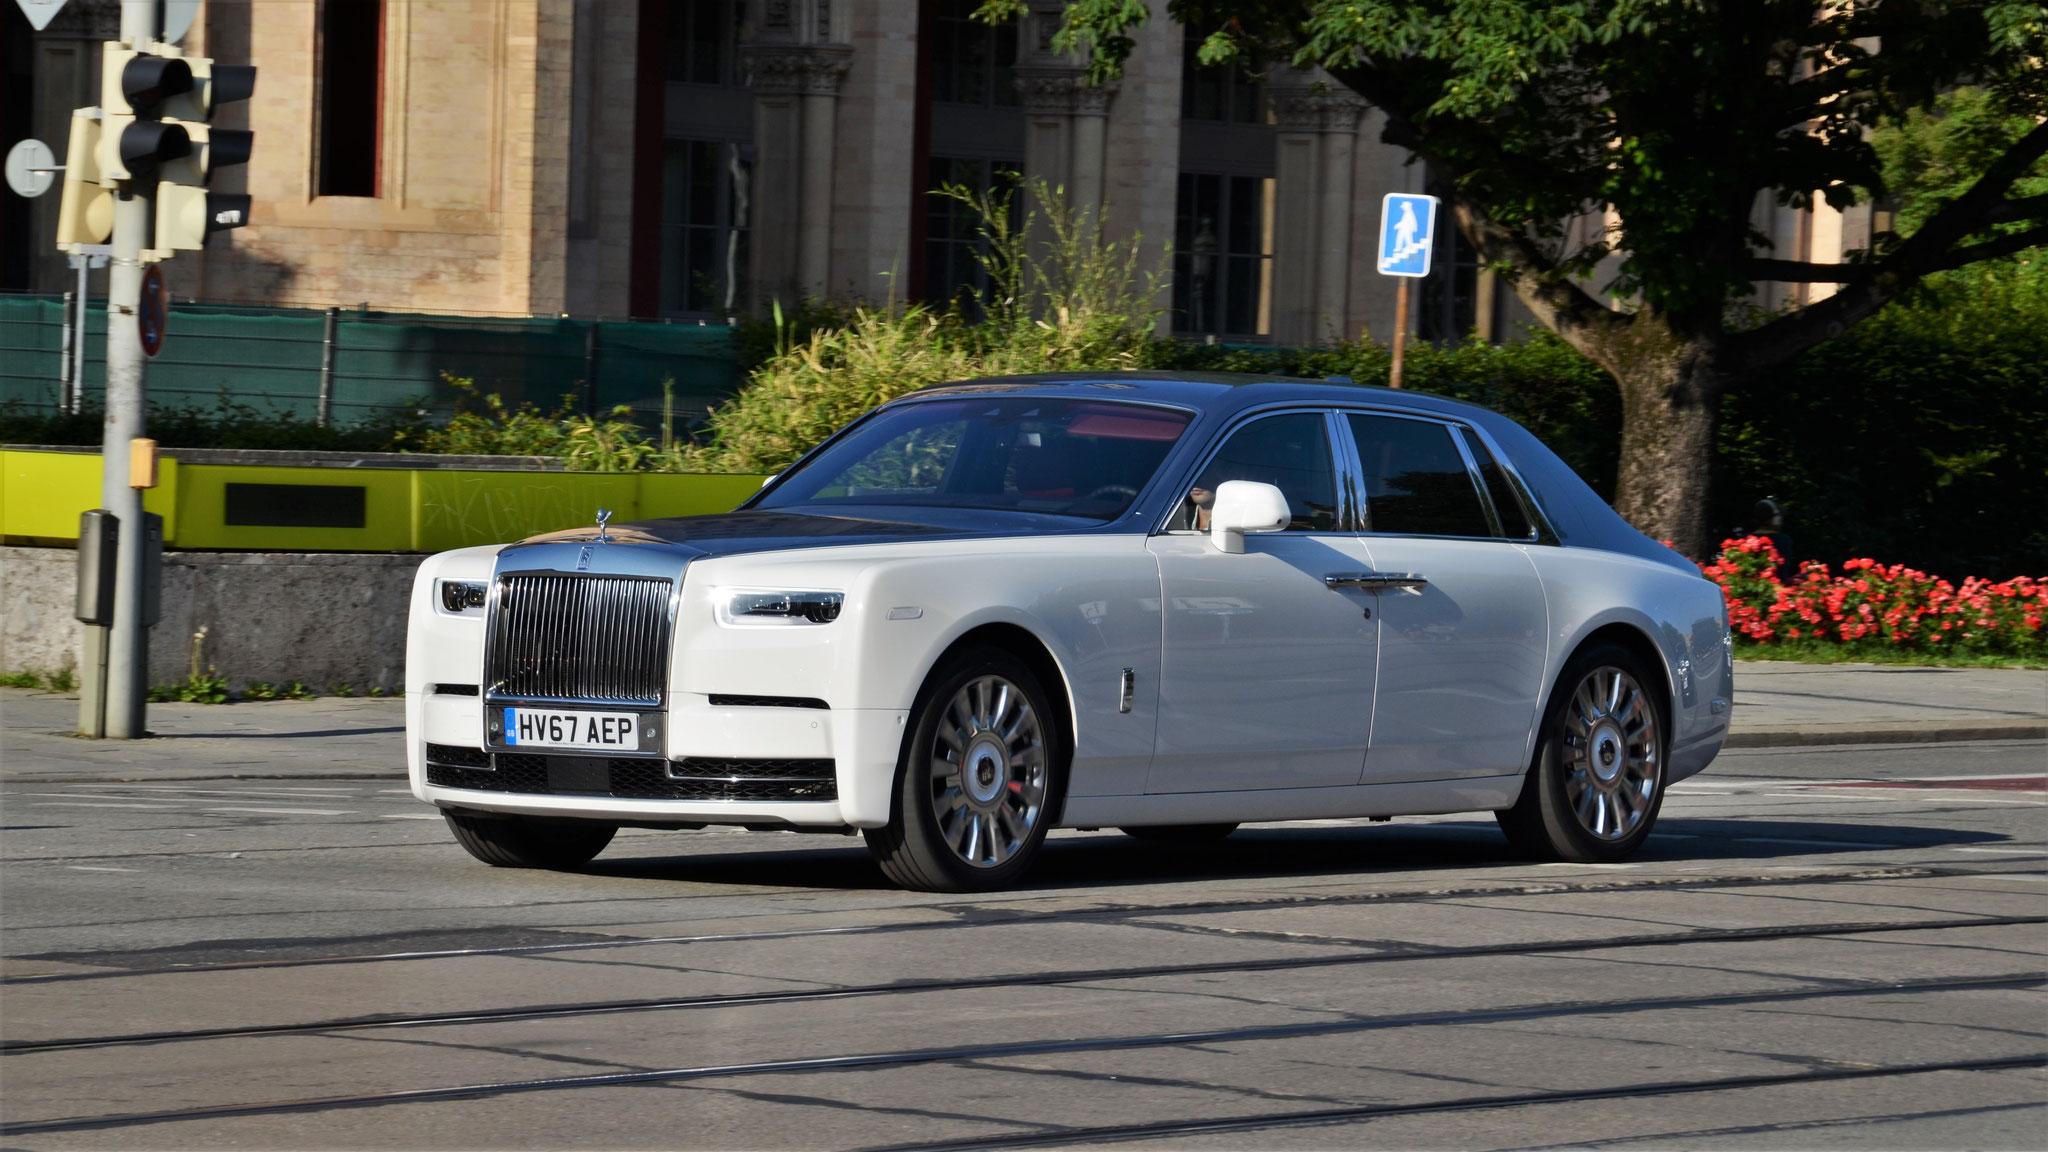 Rolls Royce Phantom - HV67-AEP (GB)